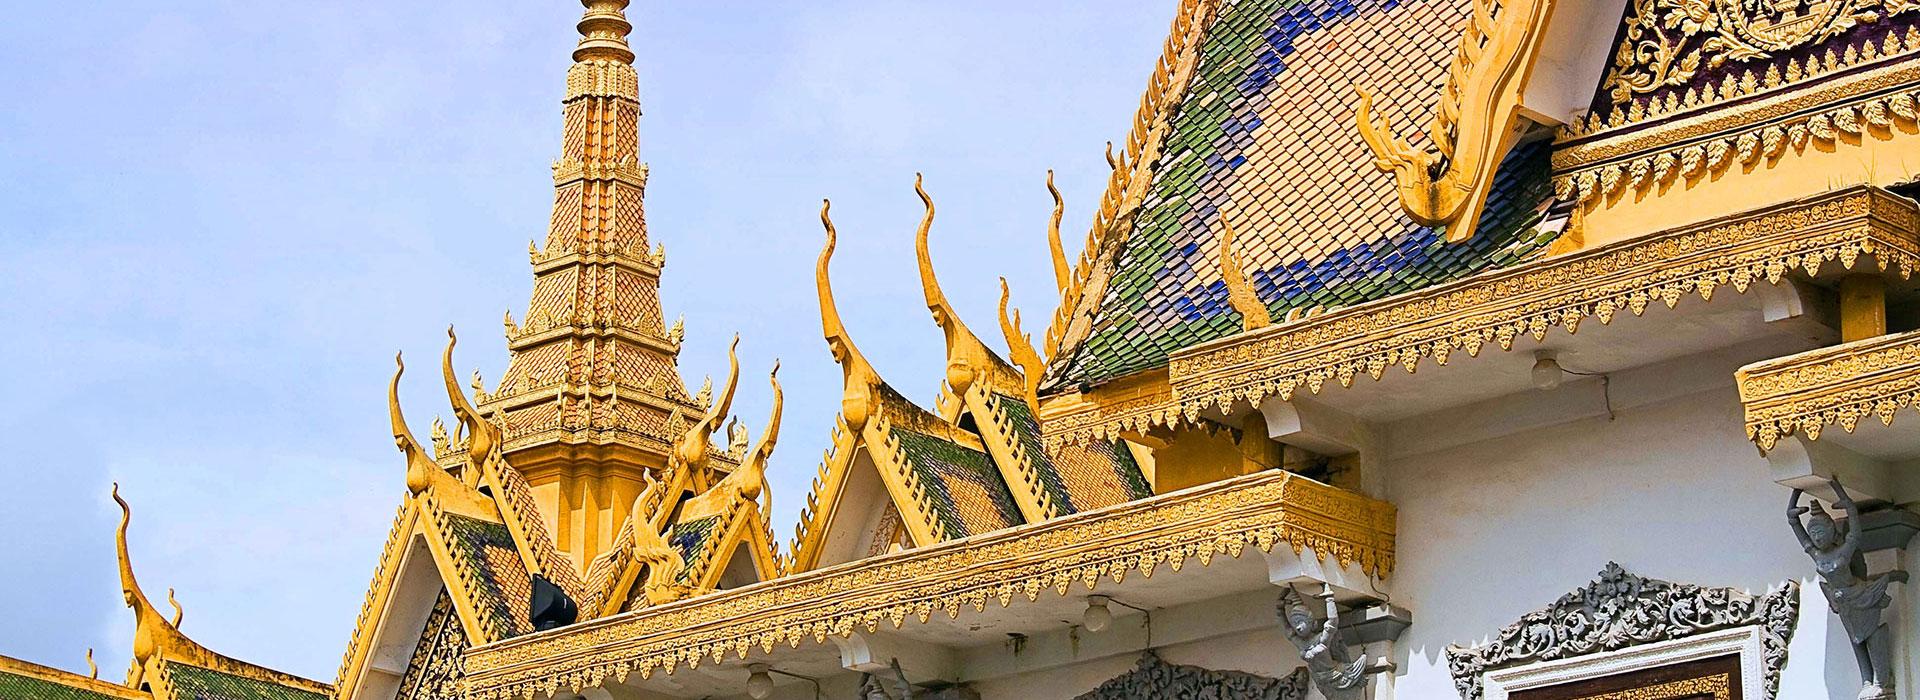 Khean ~ Cambodge l'essentiel